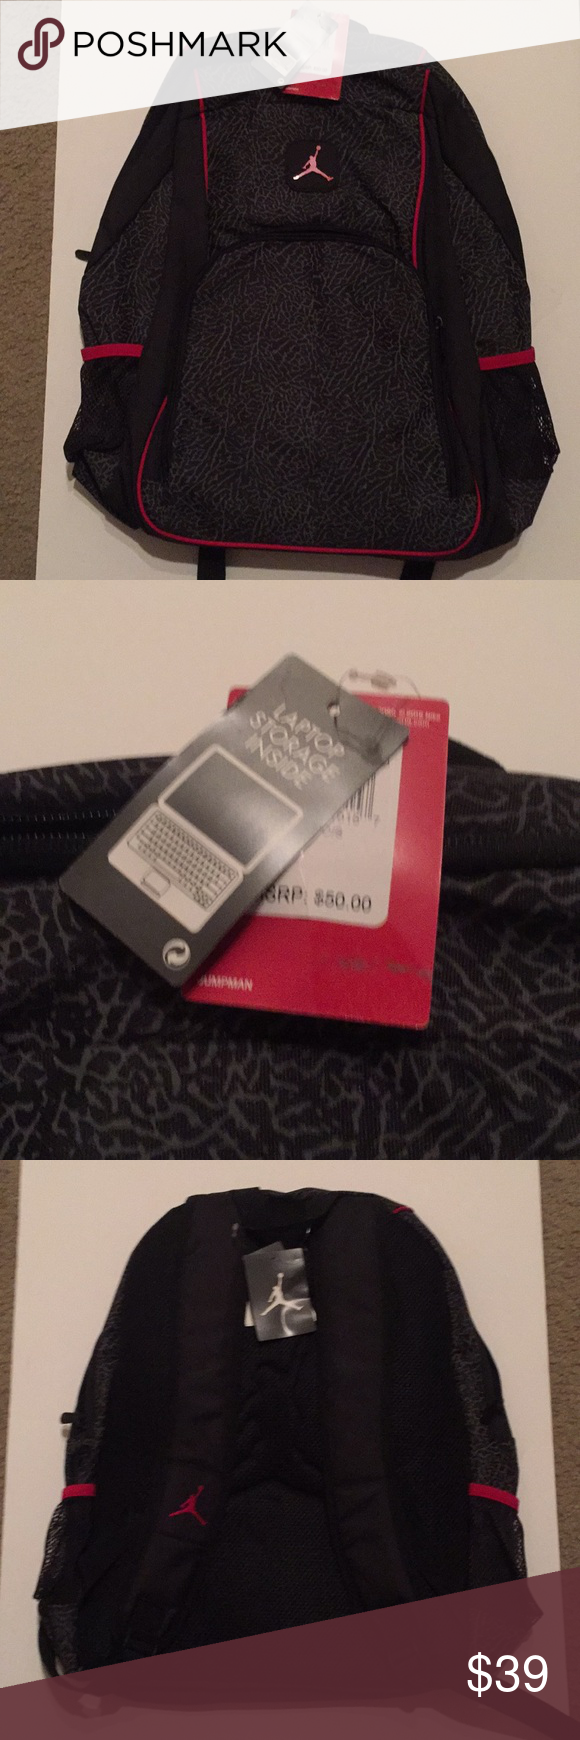 daff9475b50b89 NEW Jordan Brand Backpack Brand new Jordan Brand Backpack Black gray Red!  The tags are still attached and read  50! Jordan Bags Backpacks